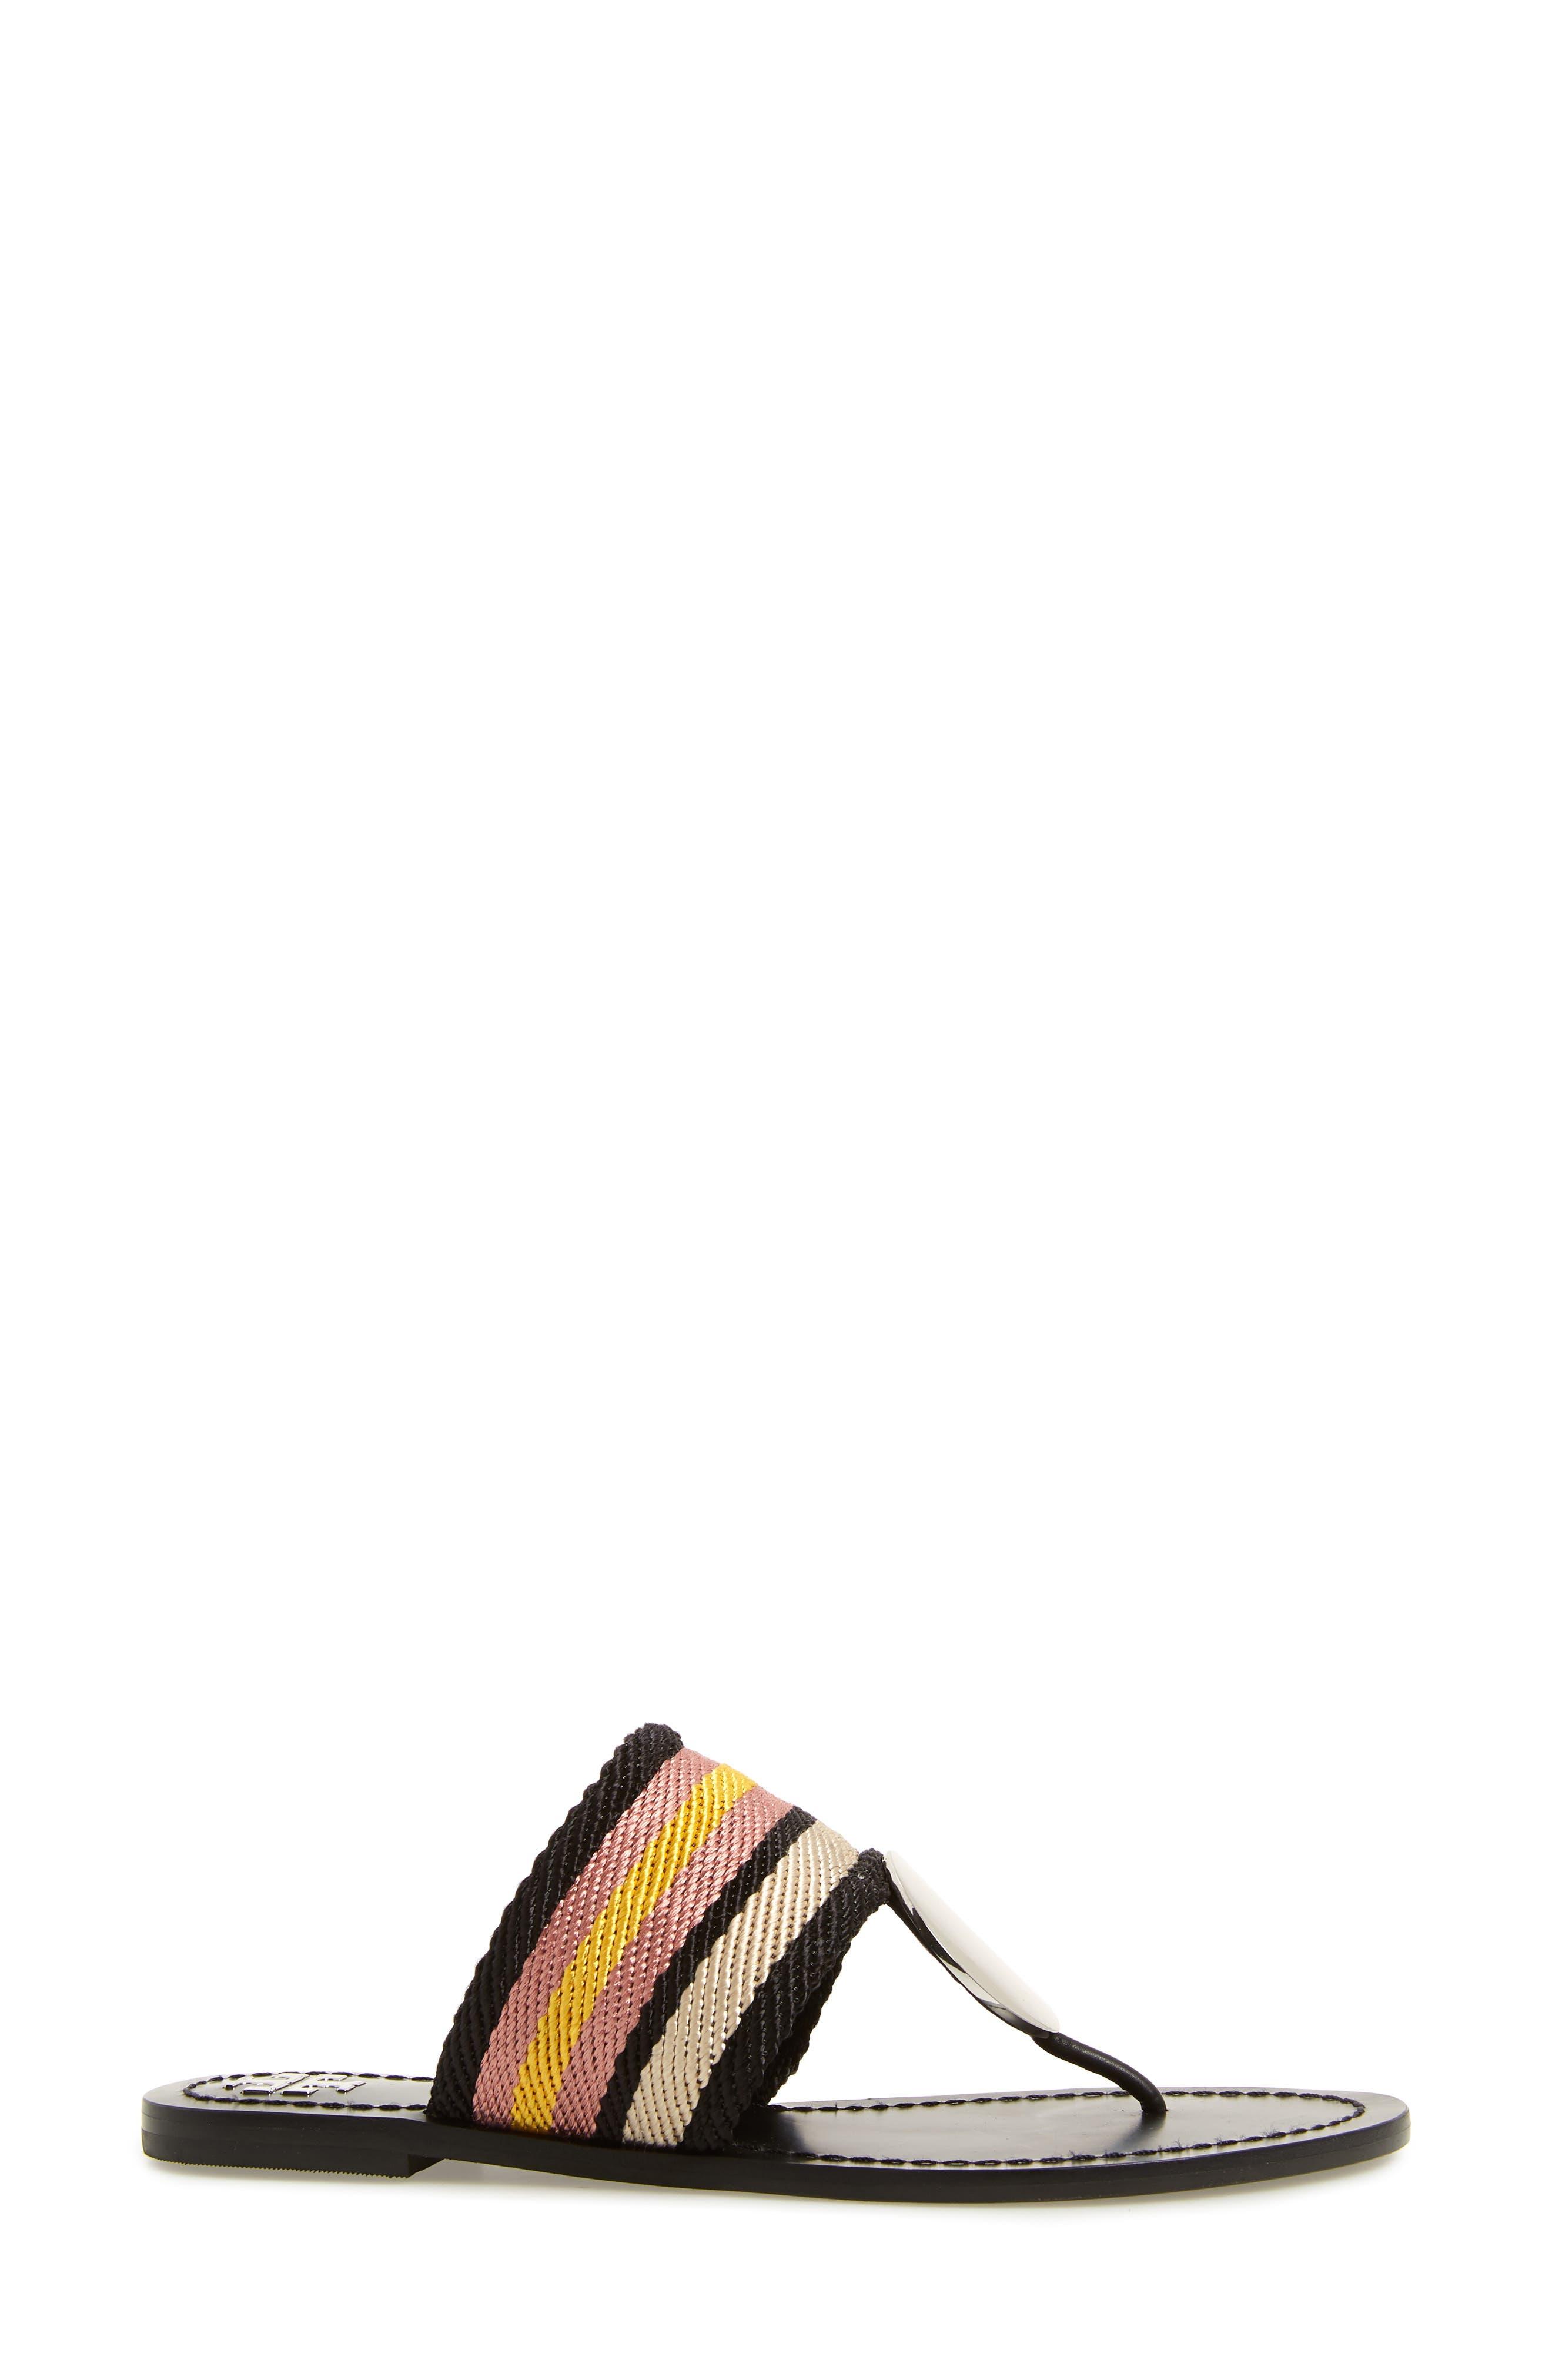 TORY BURCH,                             Patos Sandal,                             Alternate thumbnail 3, color,                             BLACK STRIPE/ PERFECT BLACK